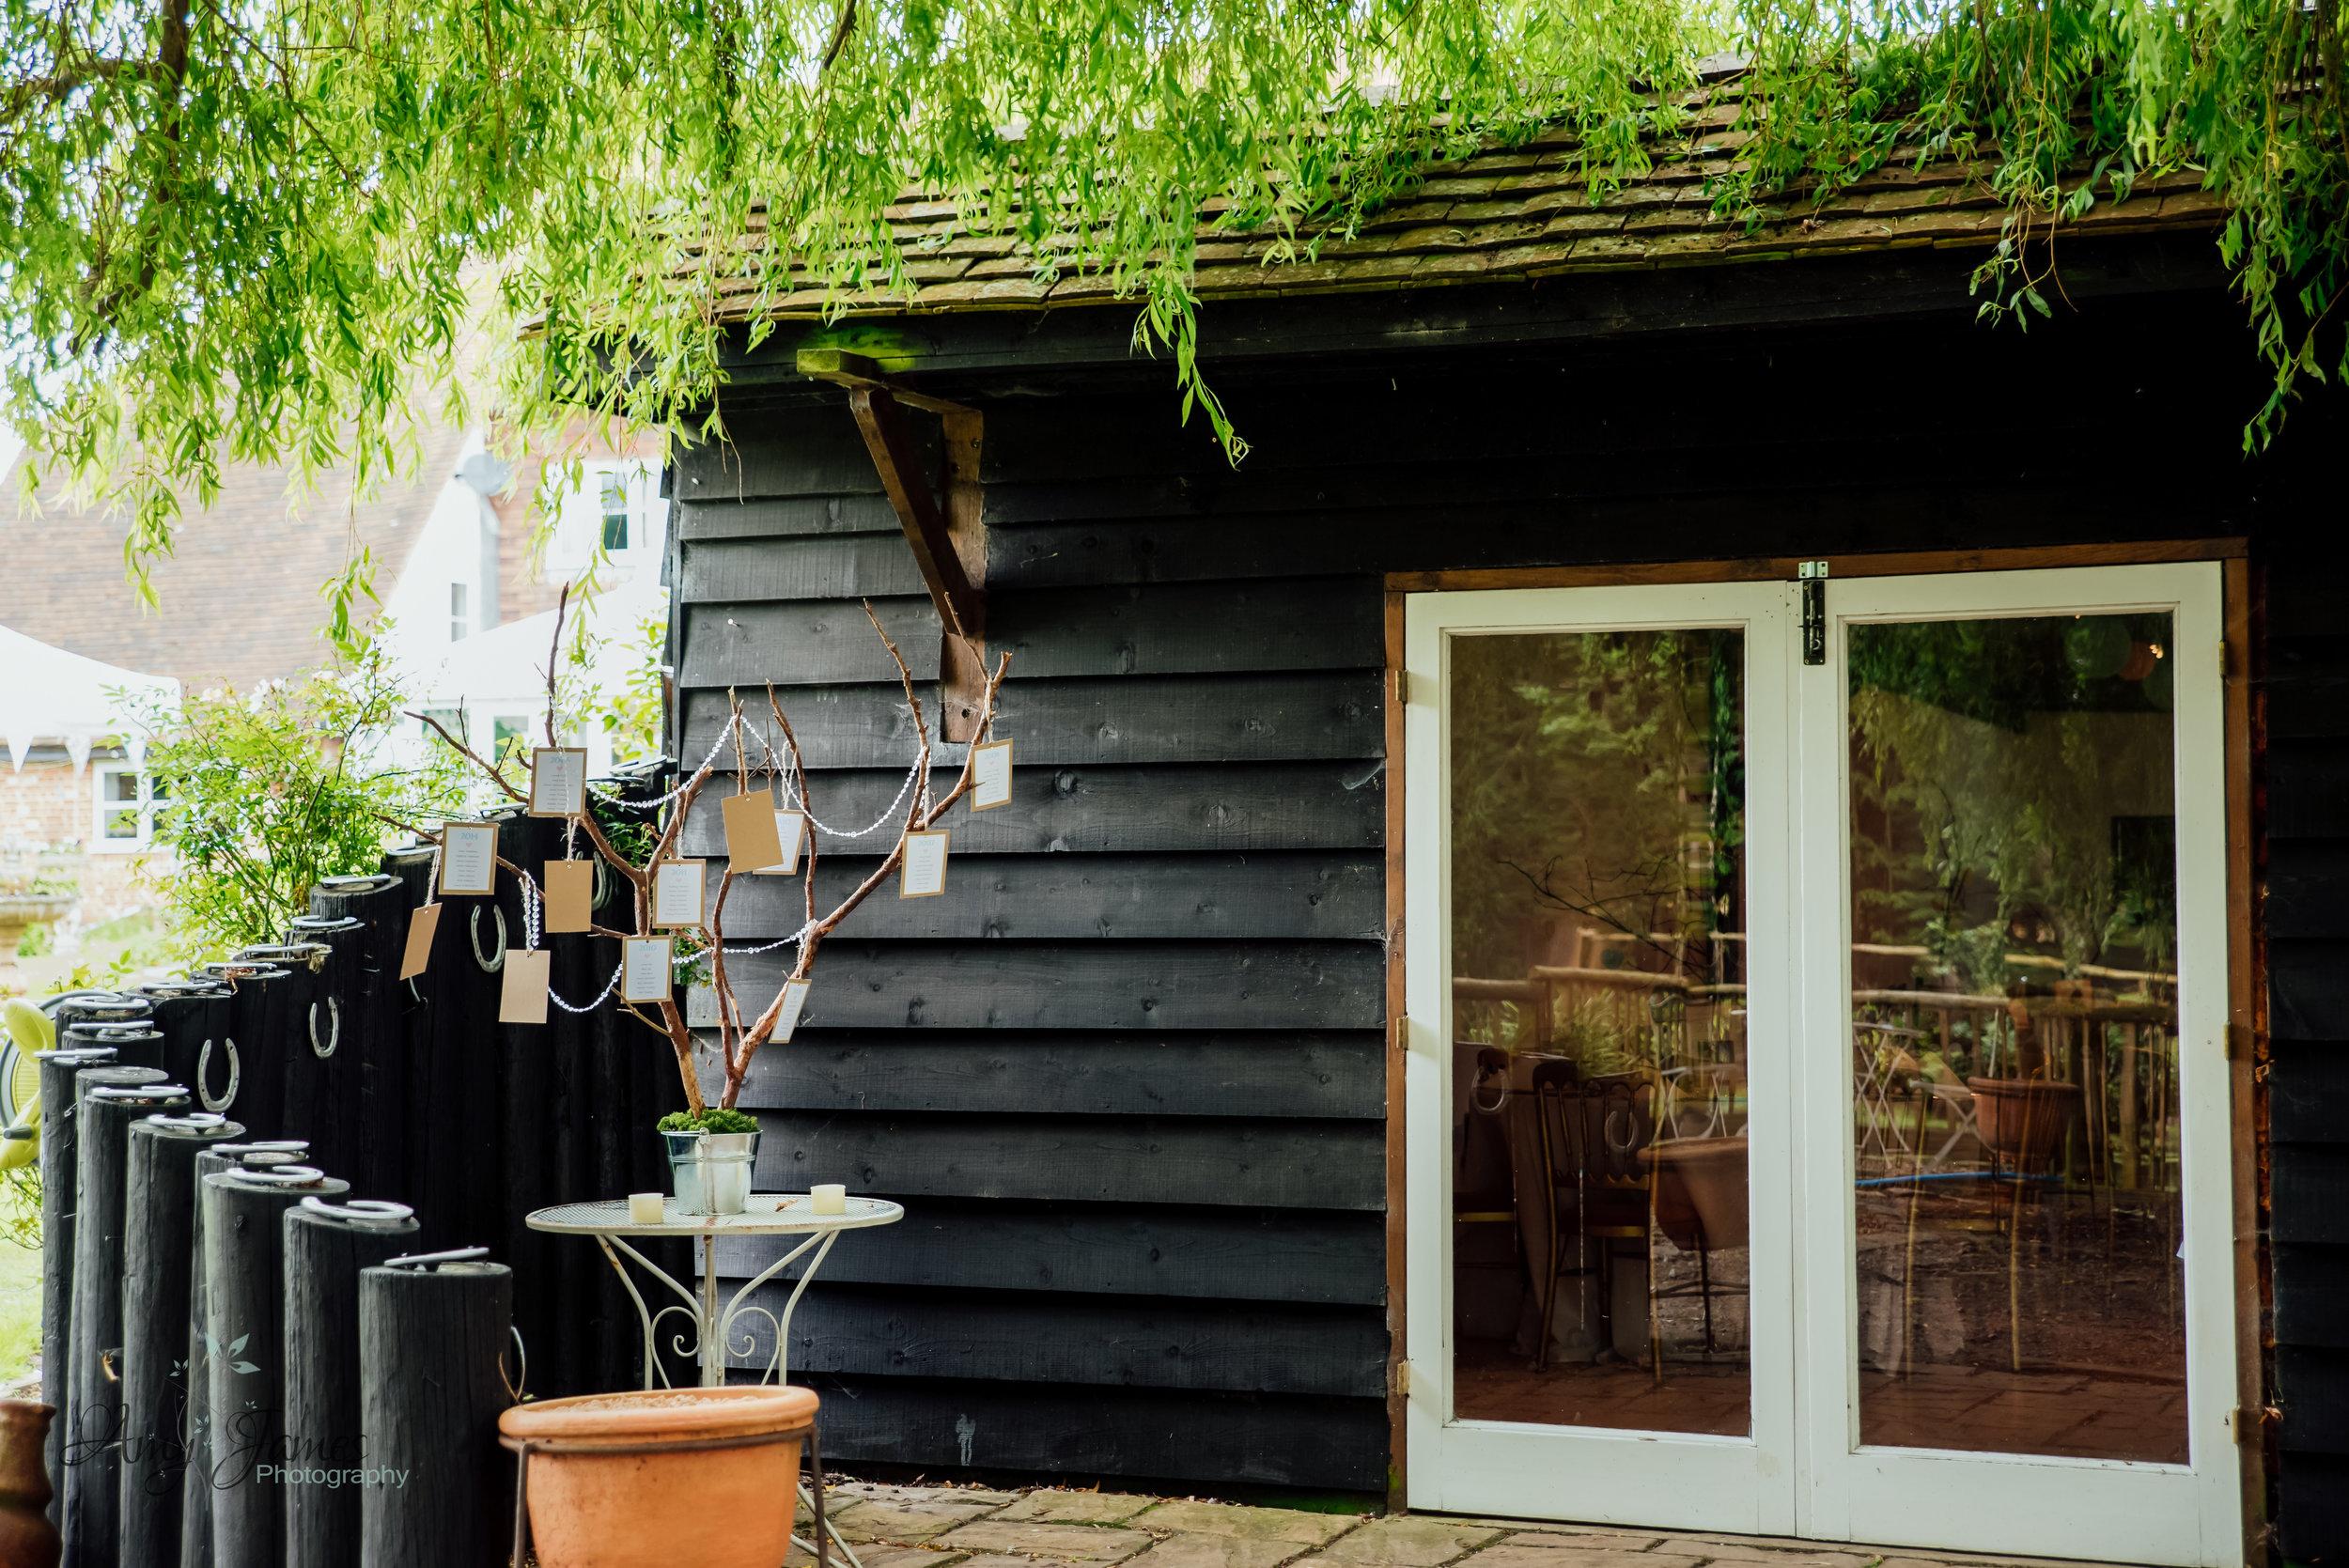 Garden wedding venue with barn wedding reception - Taplins Place Wedding - Amy James Photography - Wedding Photographer Hampshire